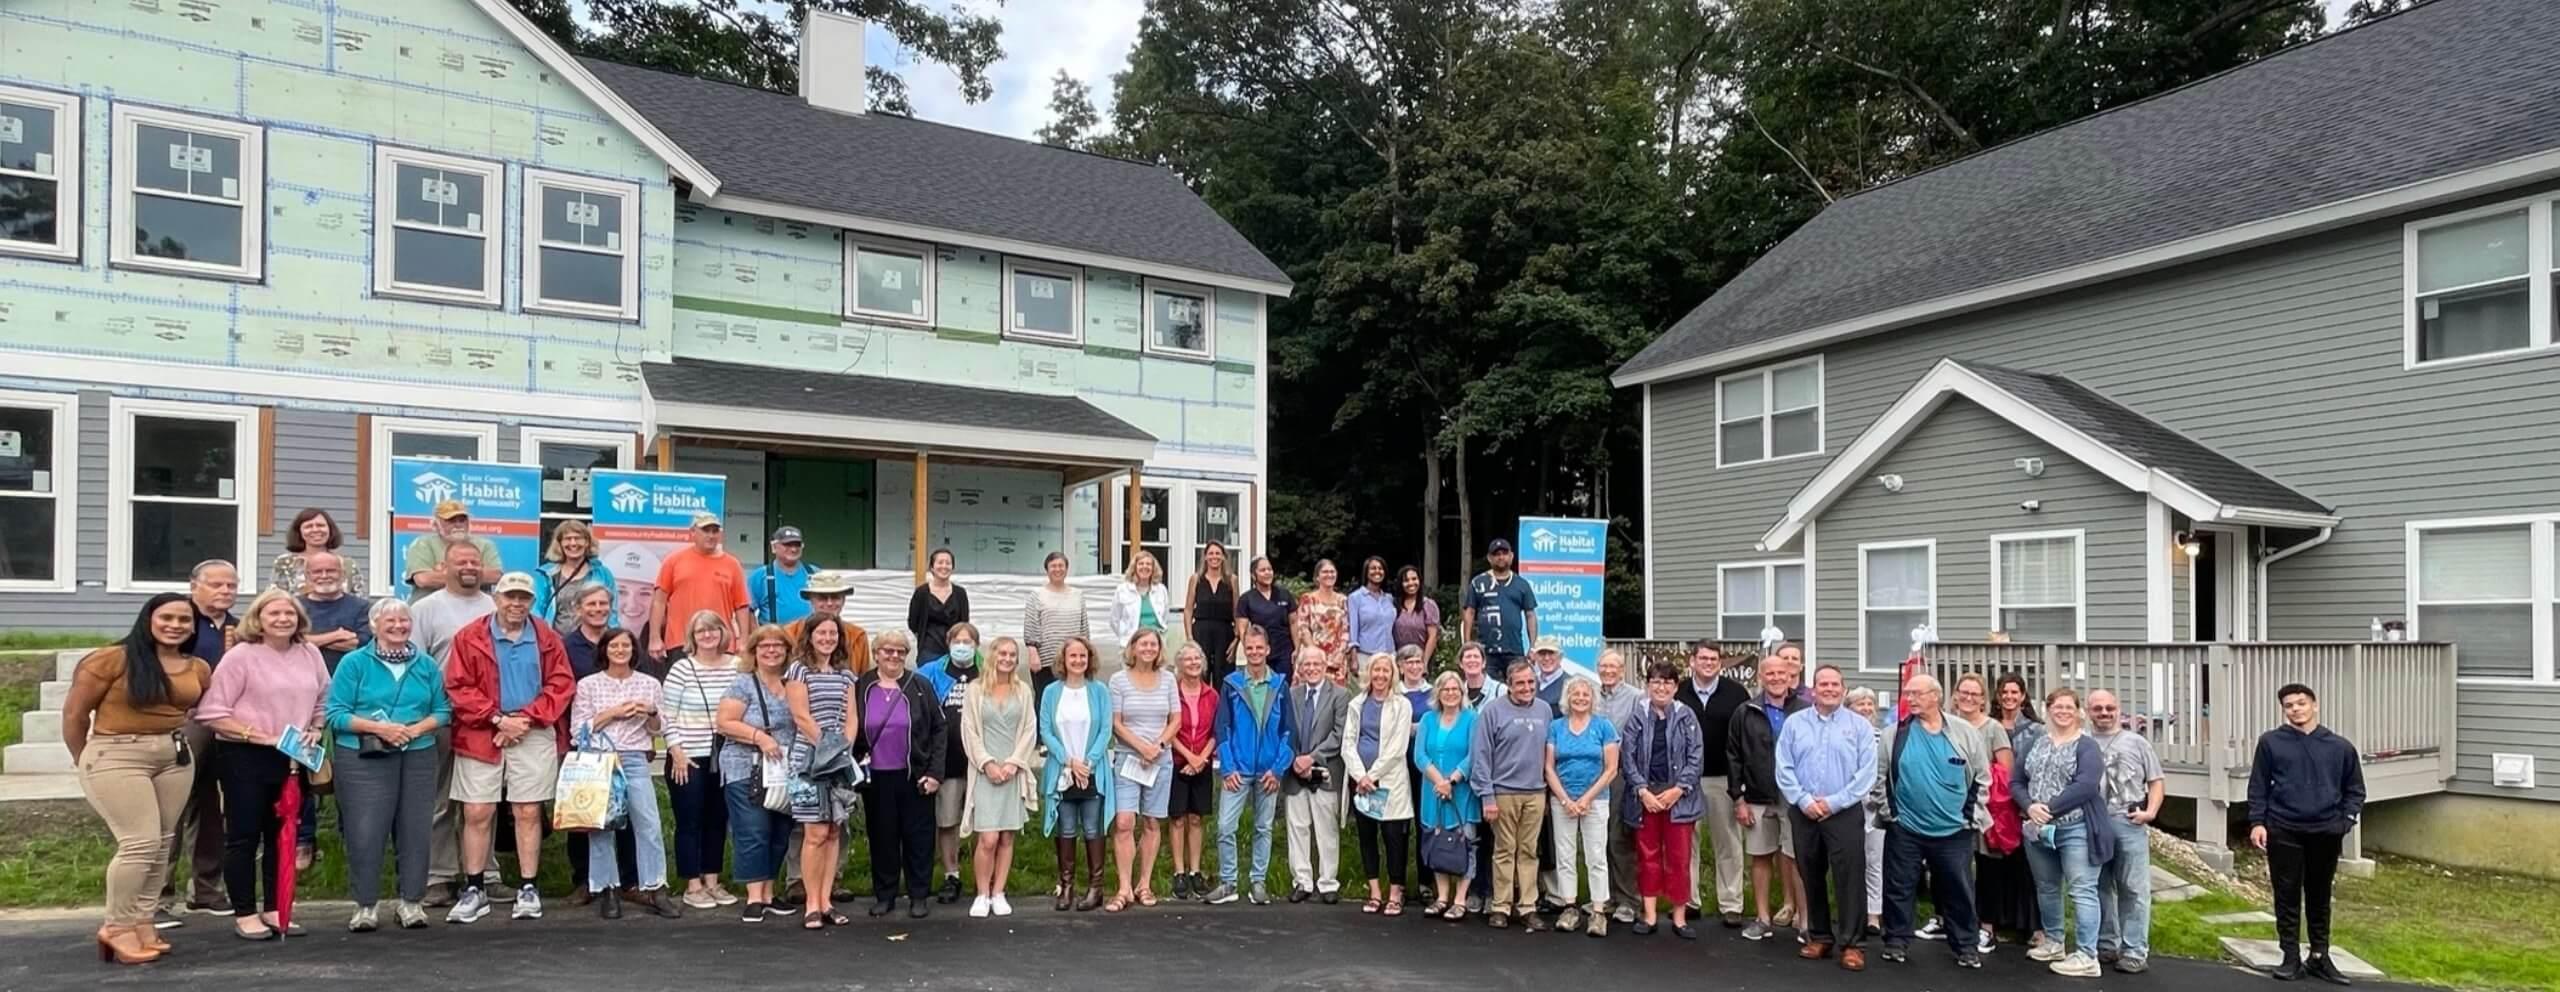 Essex County Habitat for Humanity